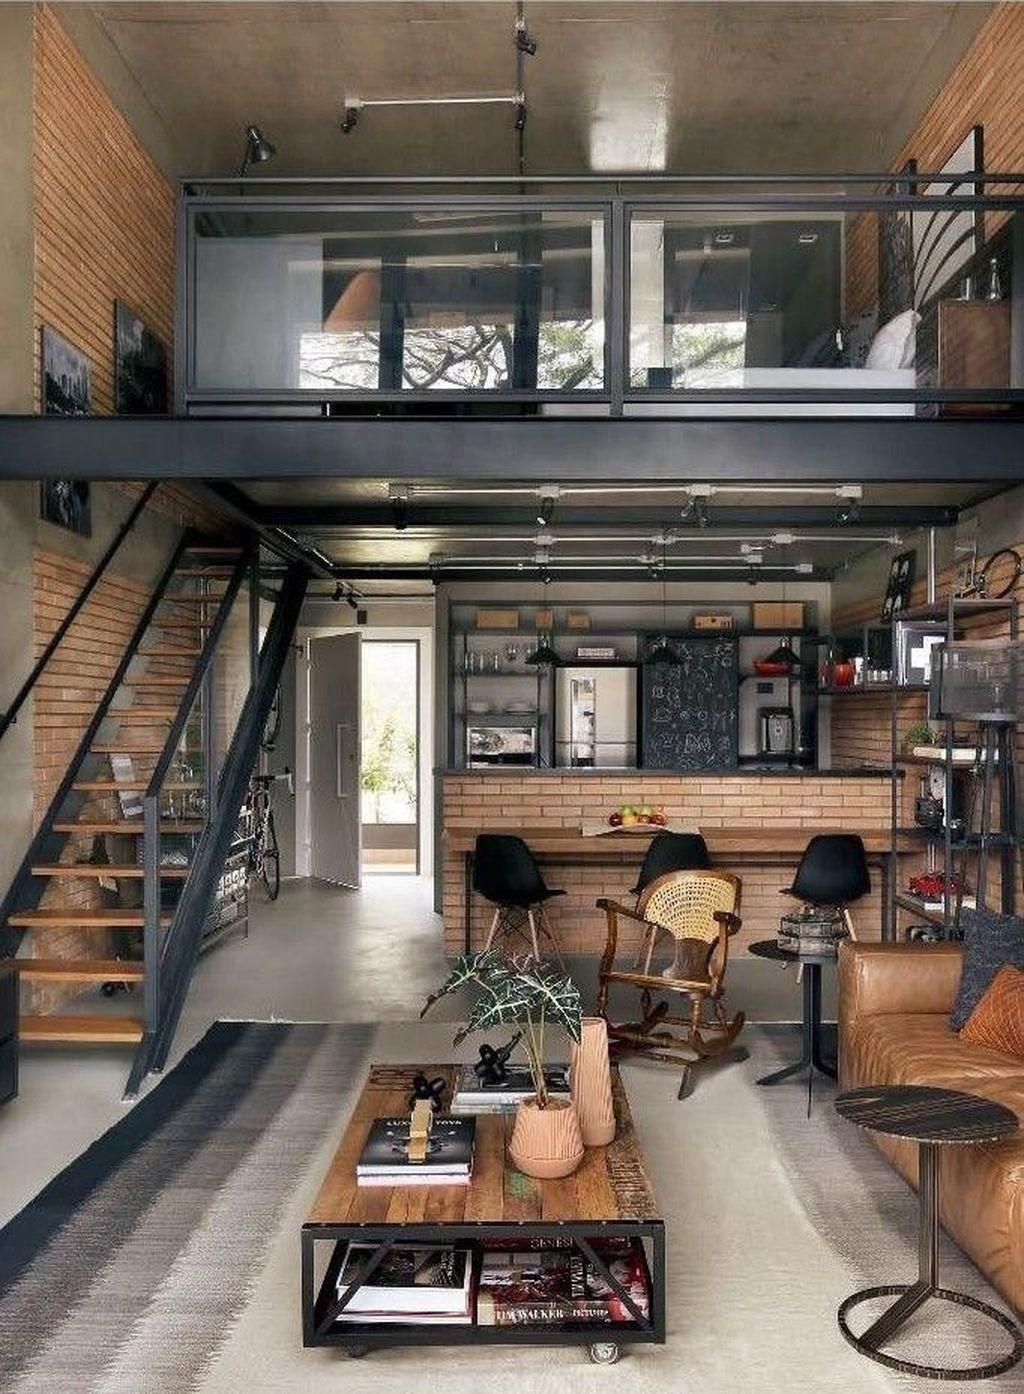 42 The Best And Unique Tiny House Design Ideas #housedesigninterior